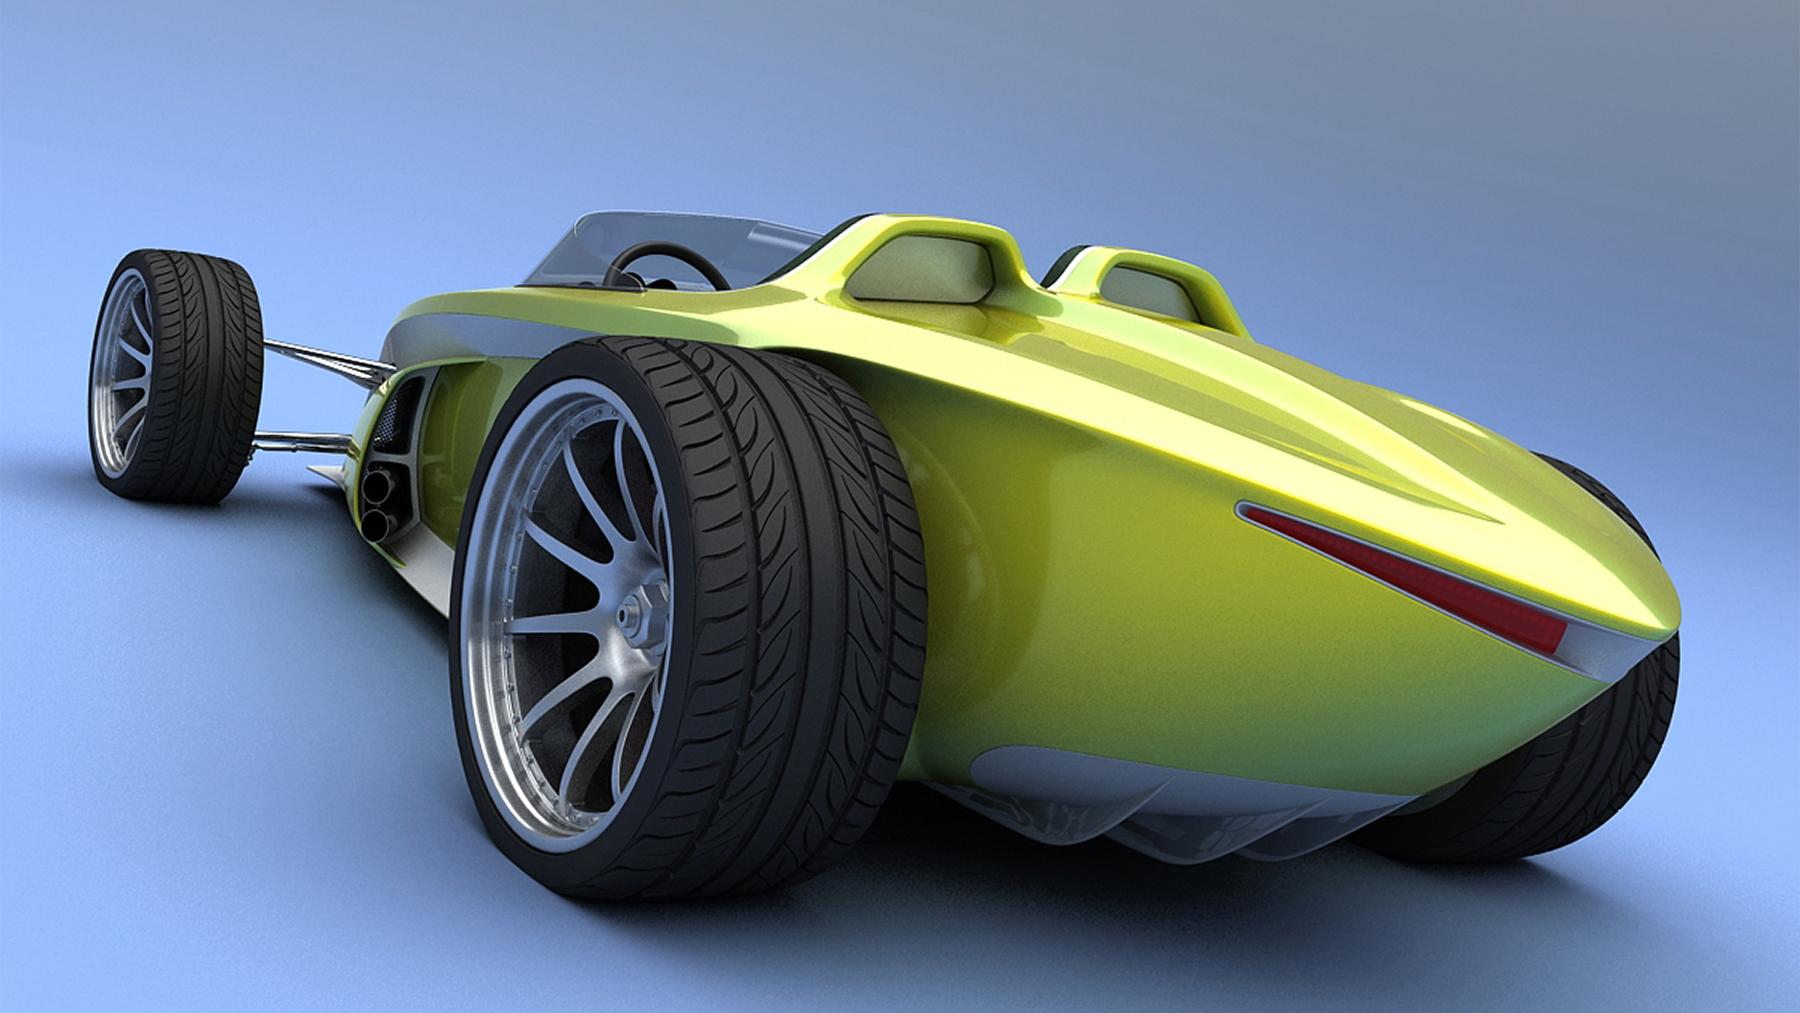 vizualtech super hotrod rendering 003